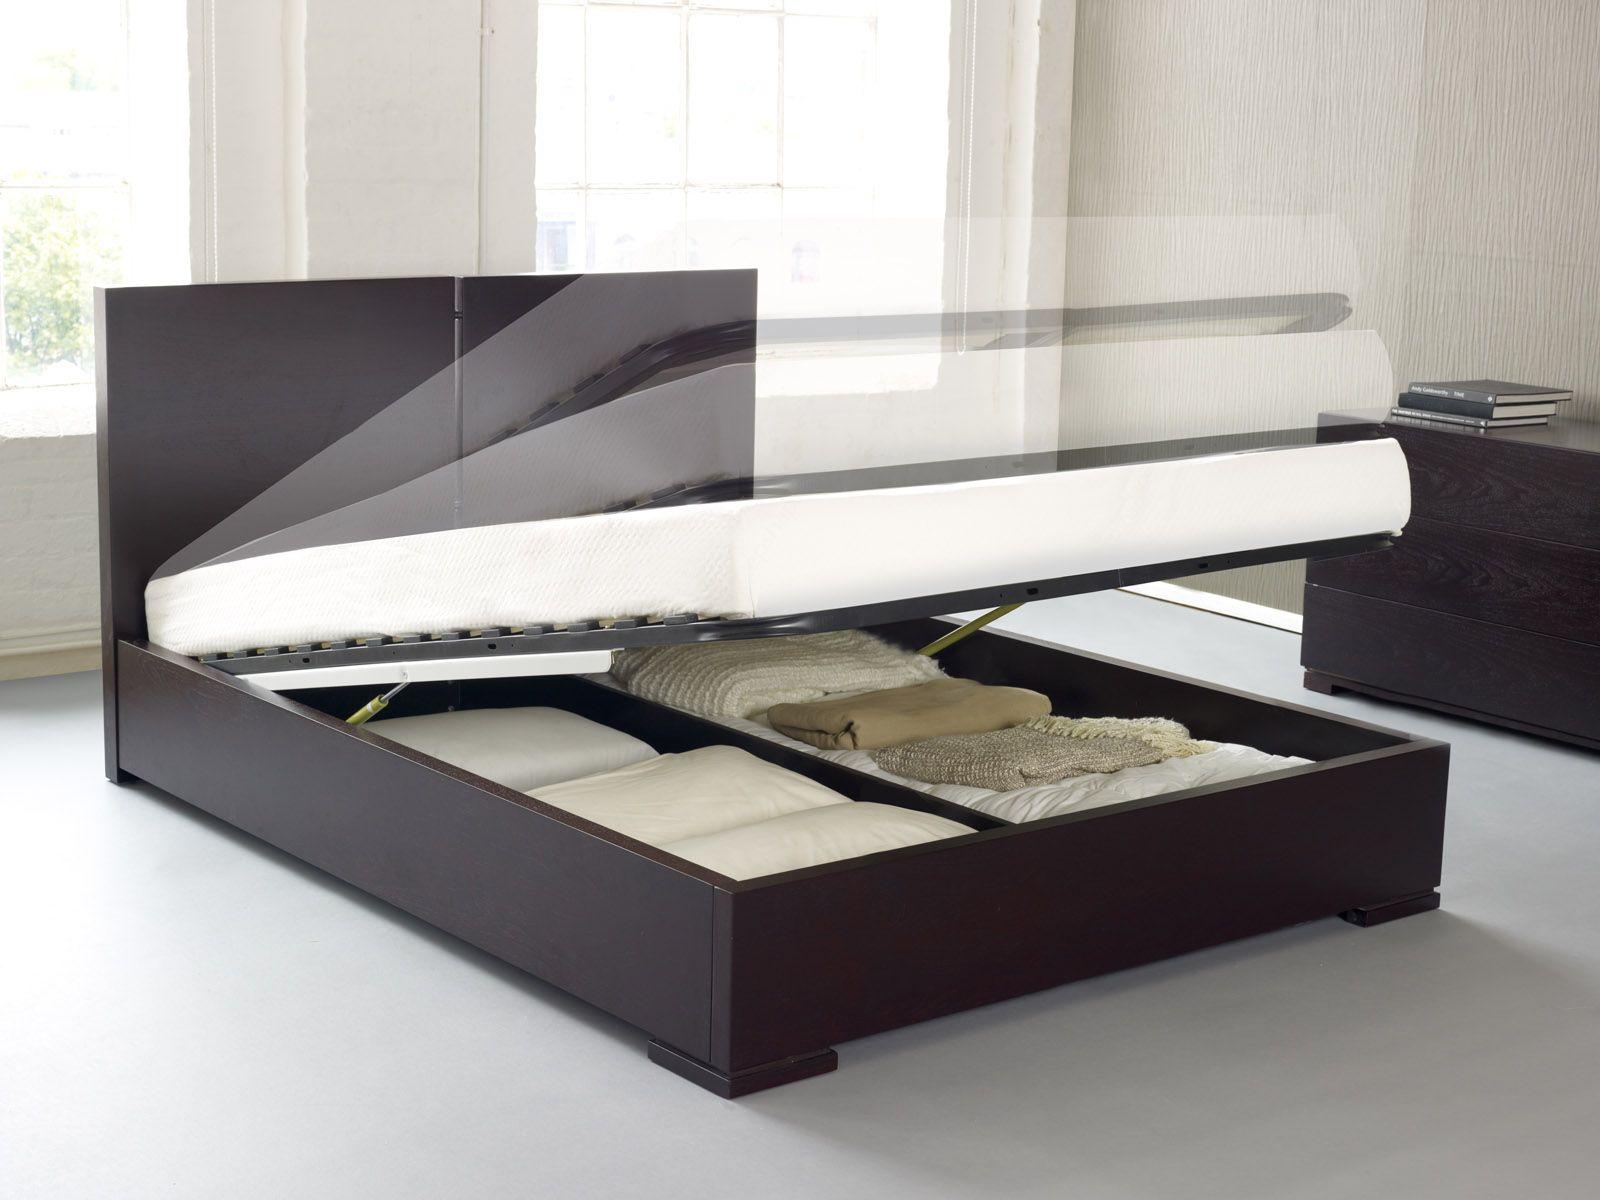 Best Latest Sleeping Bed Design Photo Bed Design Bed Design 400 x 300